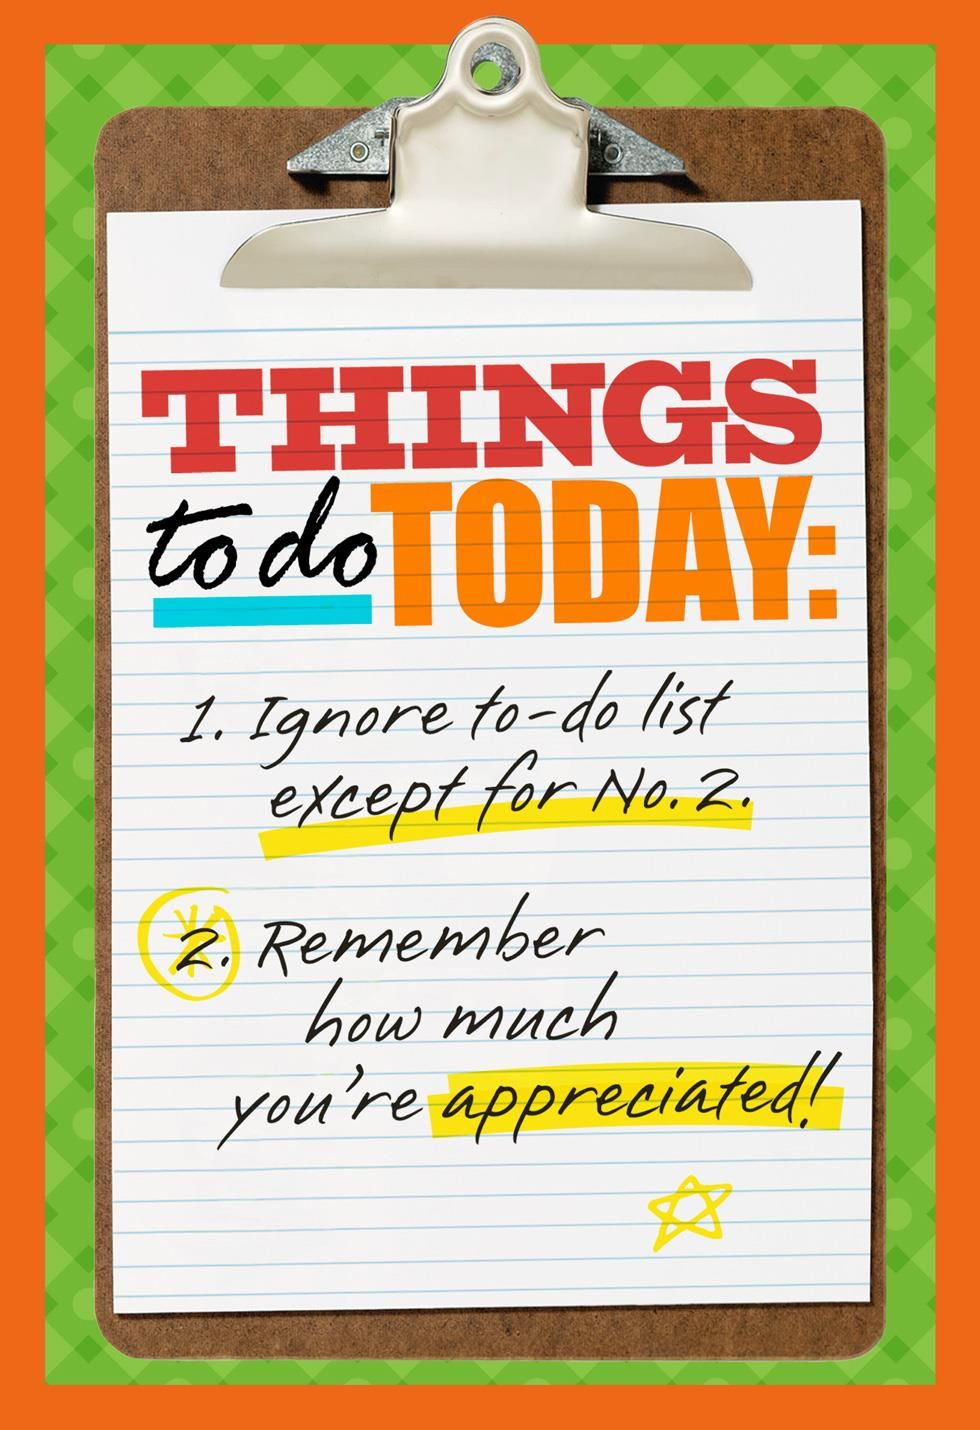 Clipboard Checklist Admin Professionals Day Card In 2021 Administrative Professional Day Secretary S Day Administrative Professional